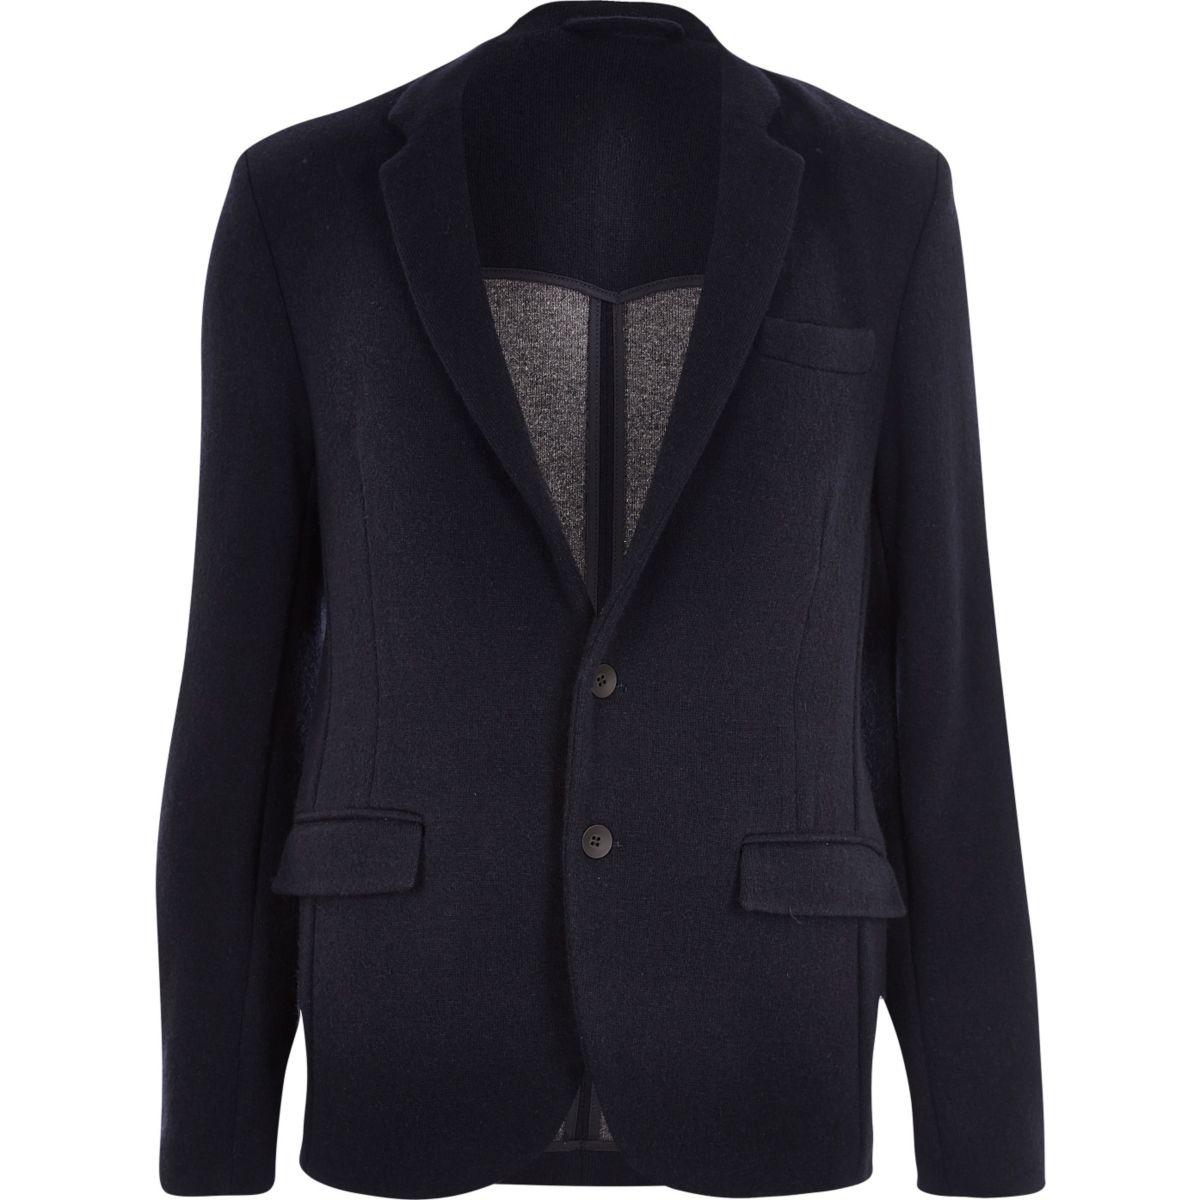 Navy knitted jersey slim blazer